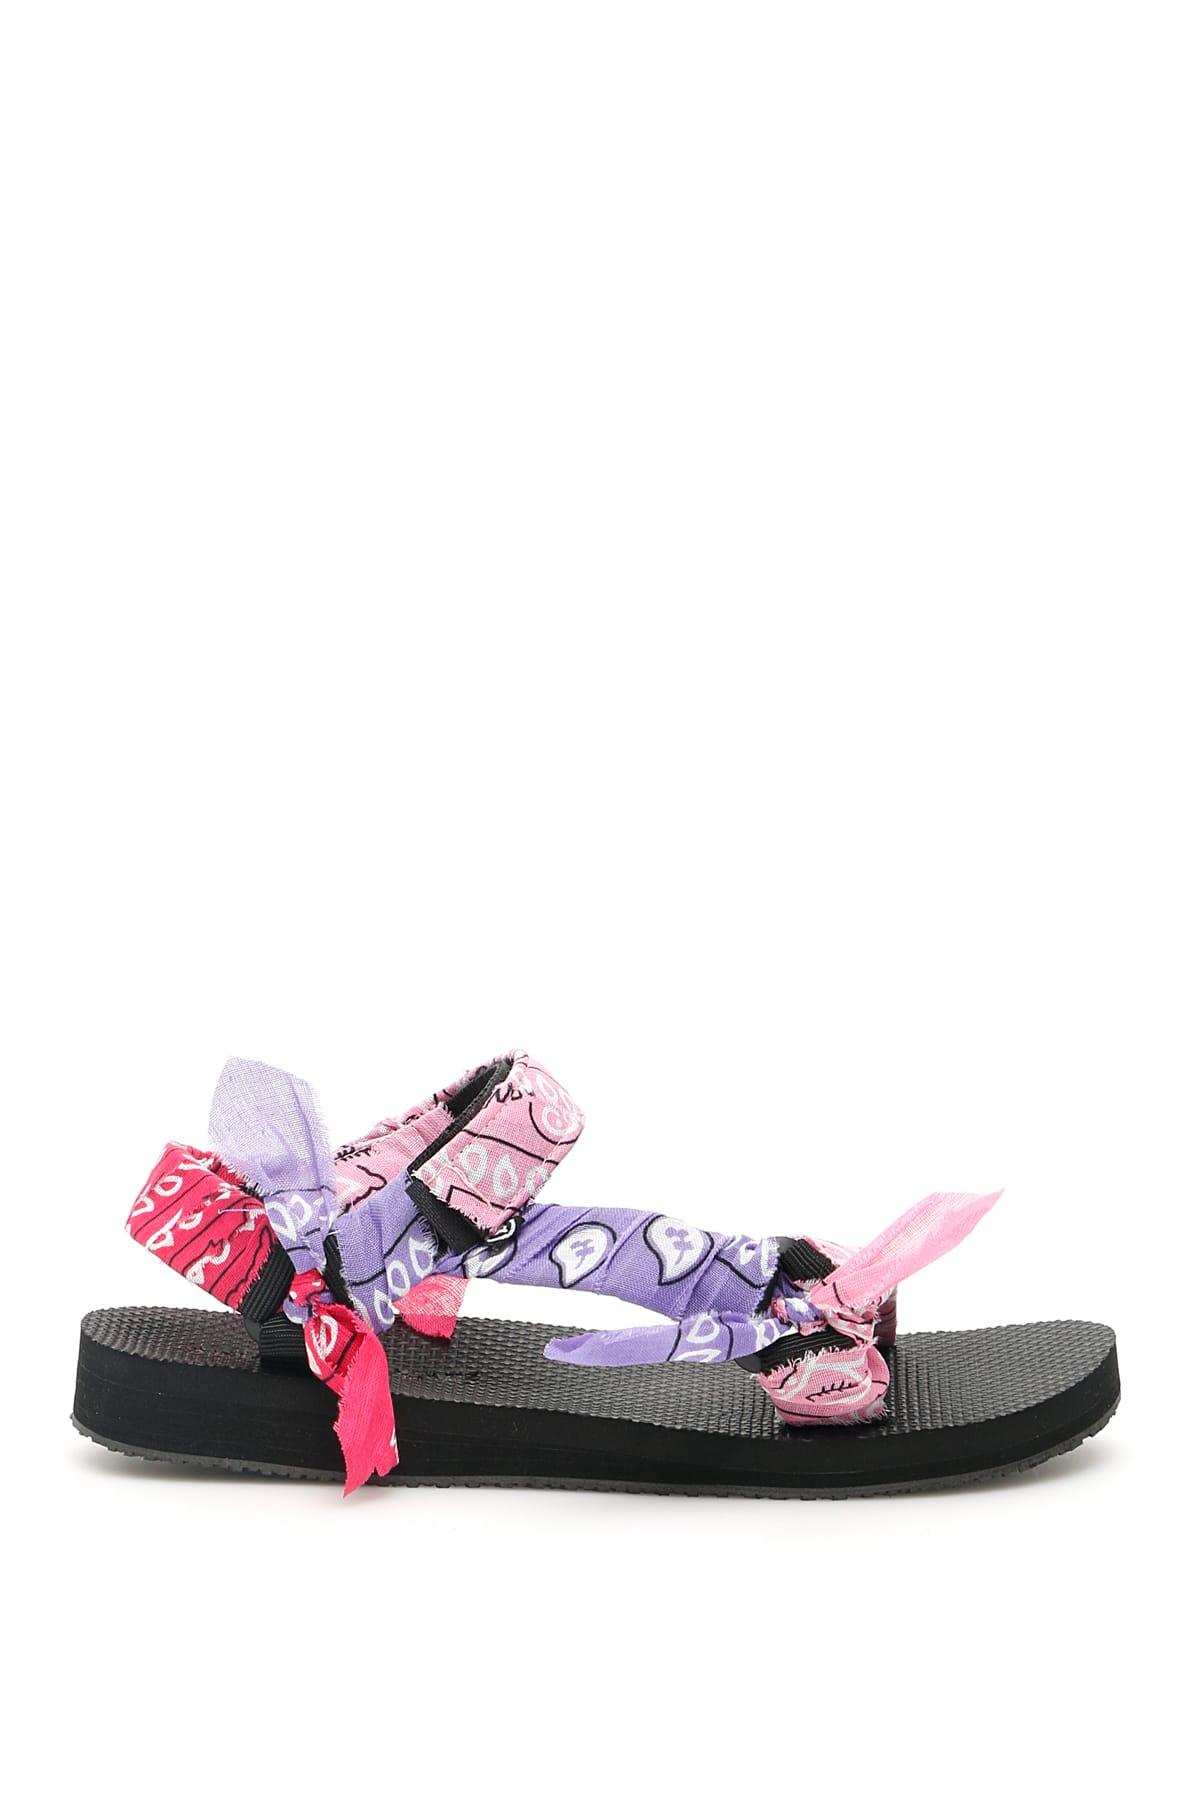 Arizona Love Shoes BANDANA TREKKY SANDALS